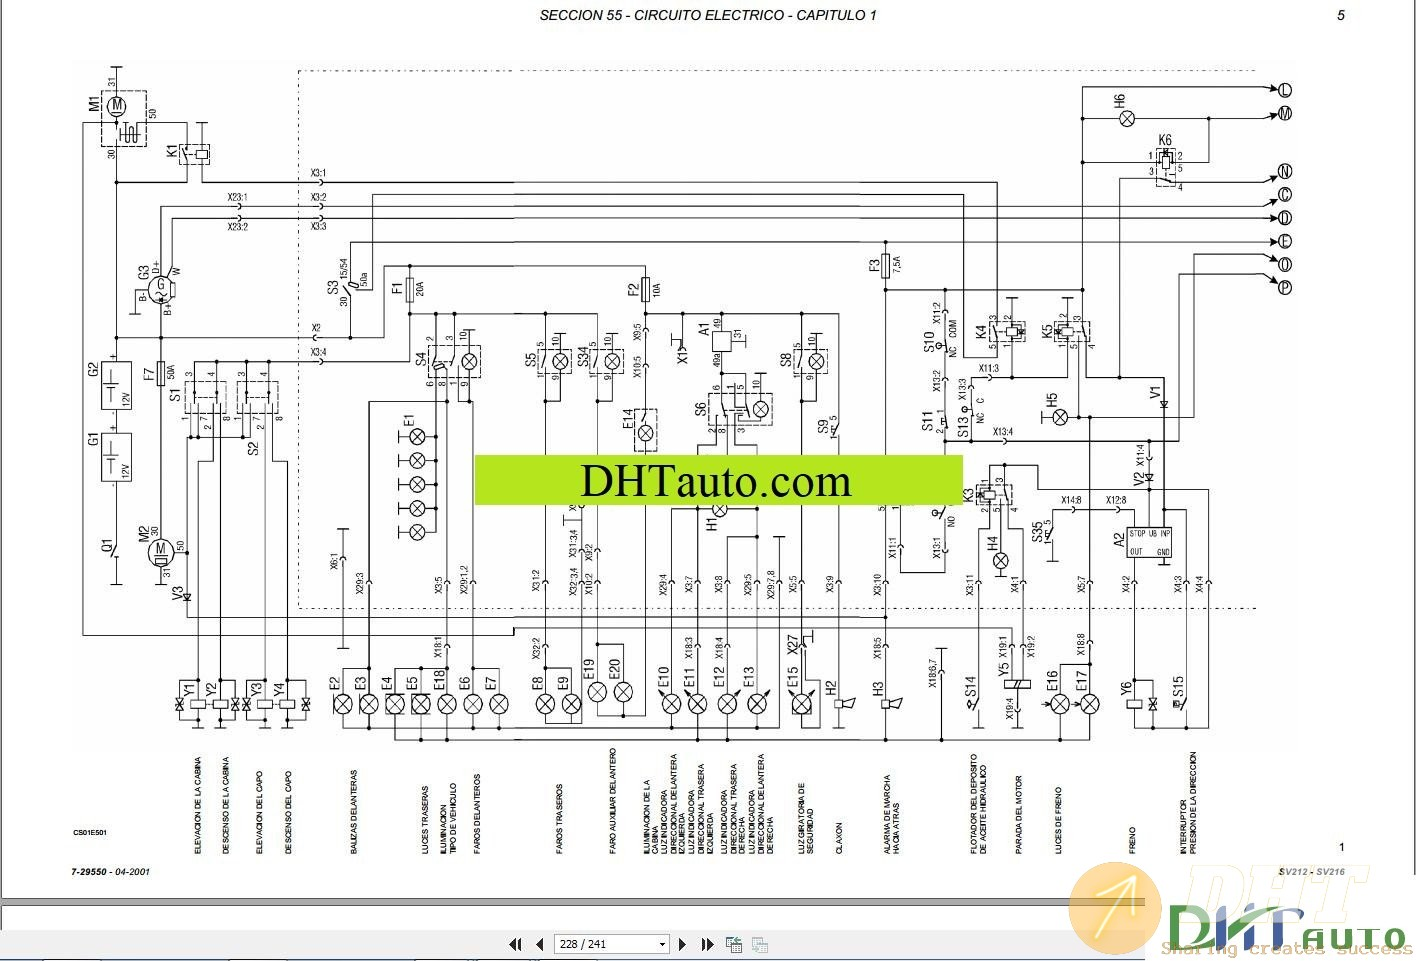 Case Vibratory Roller Operators & Service Manuals 5.jpg